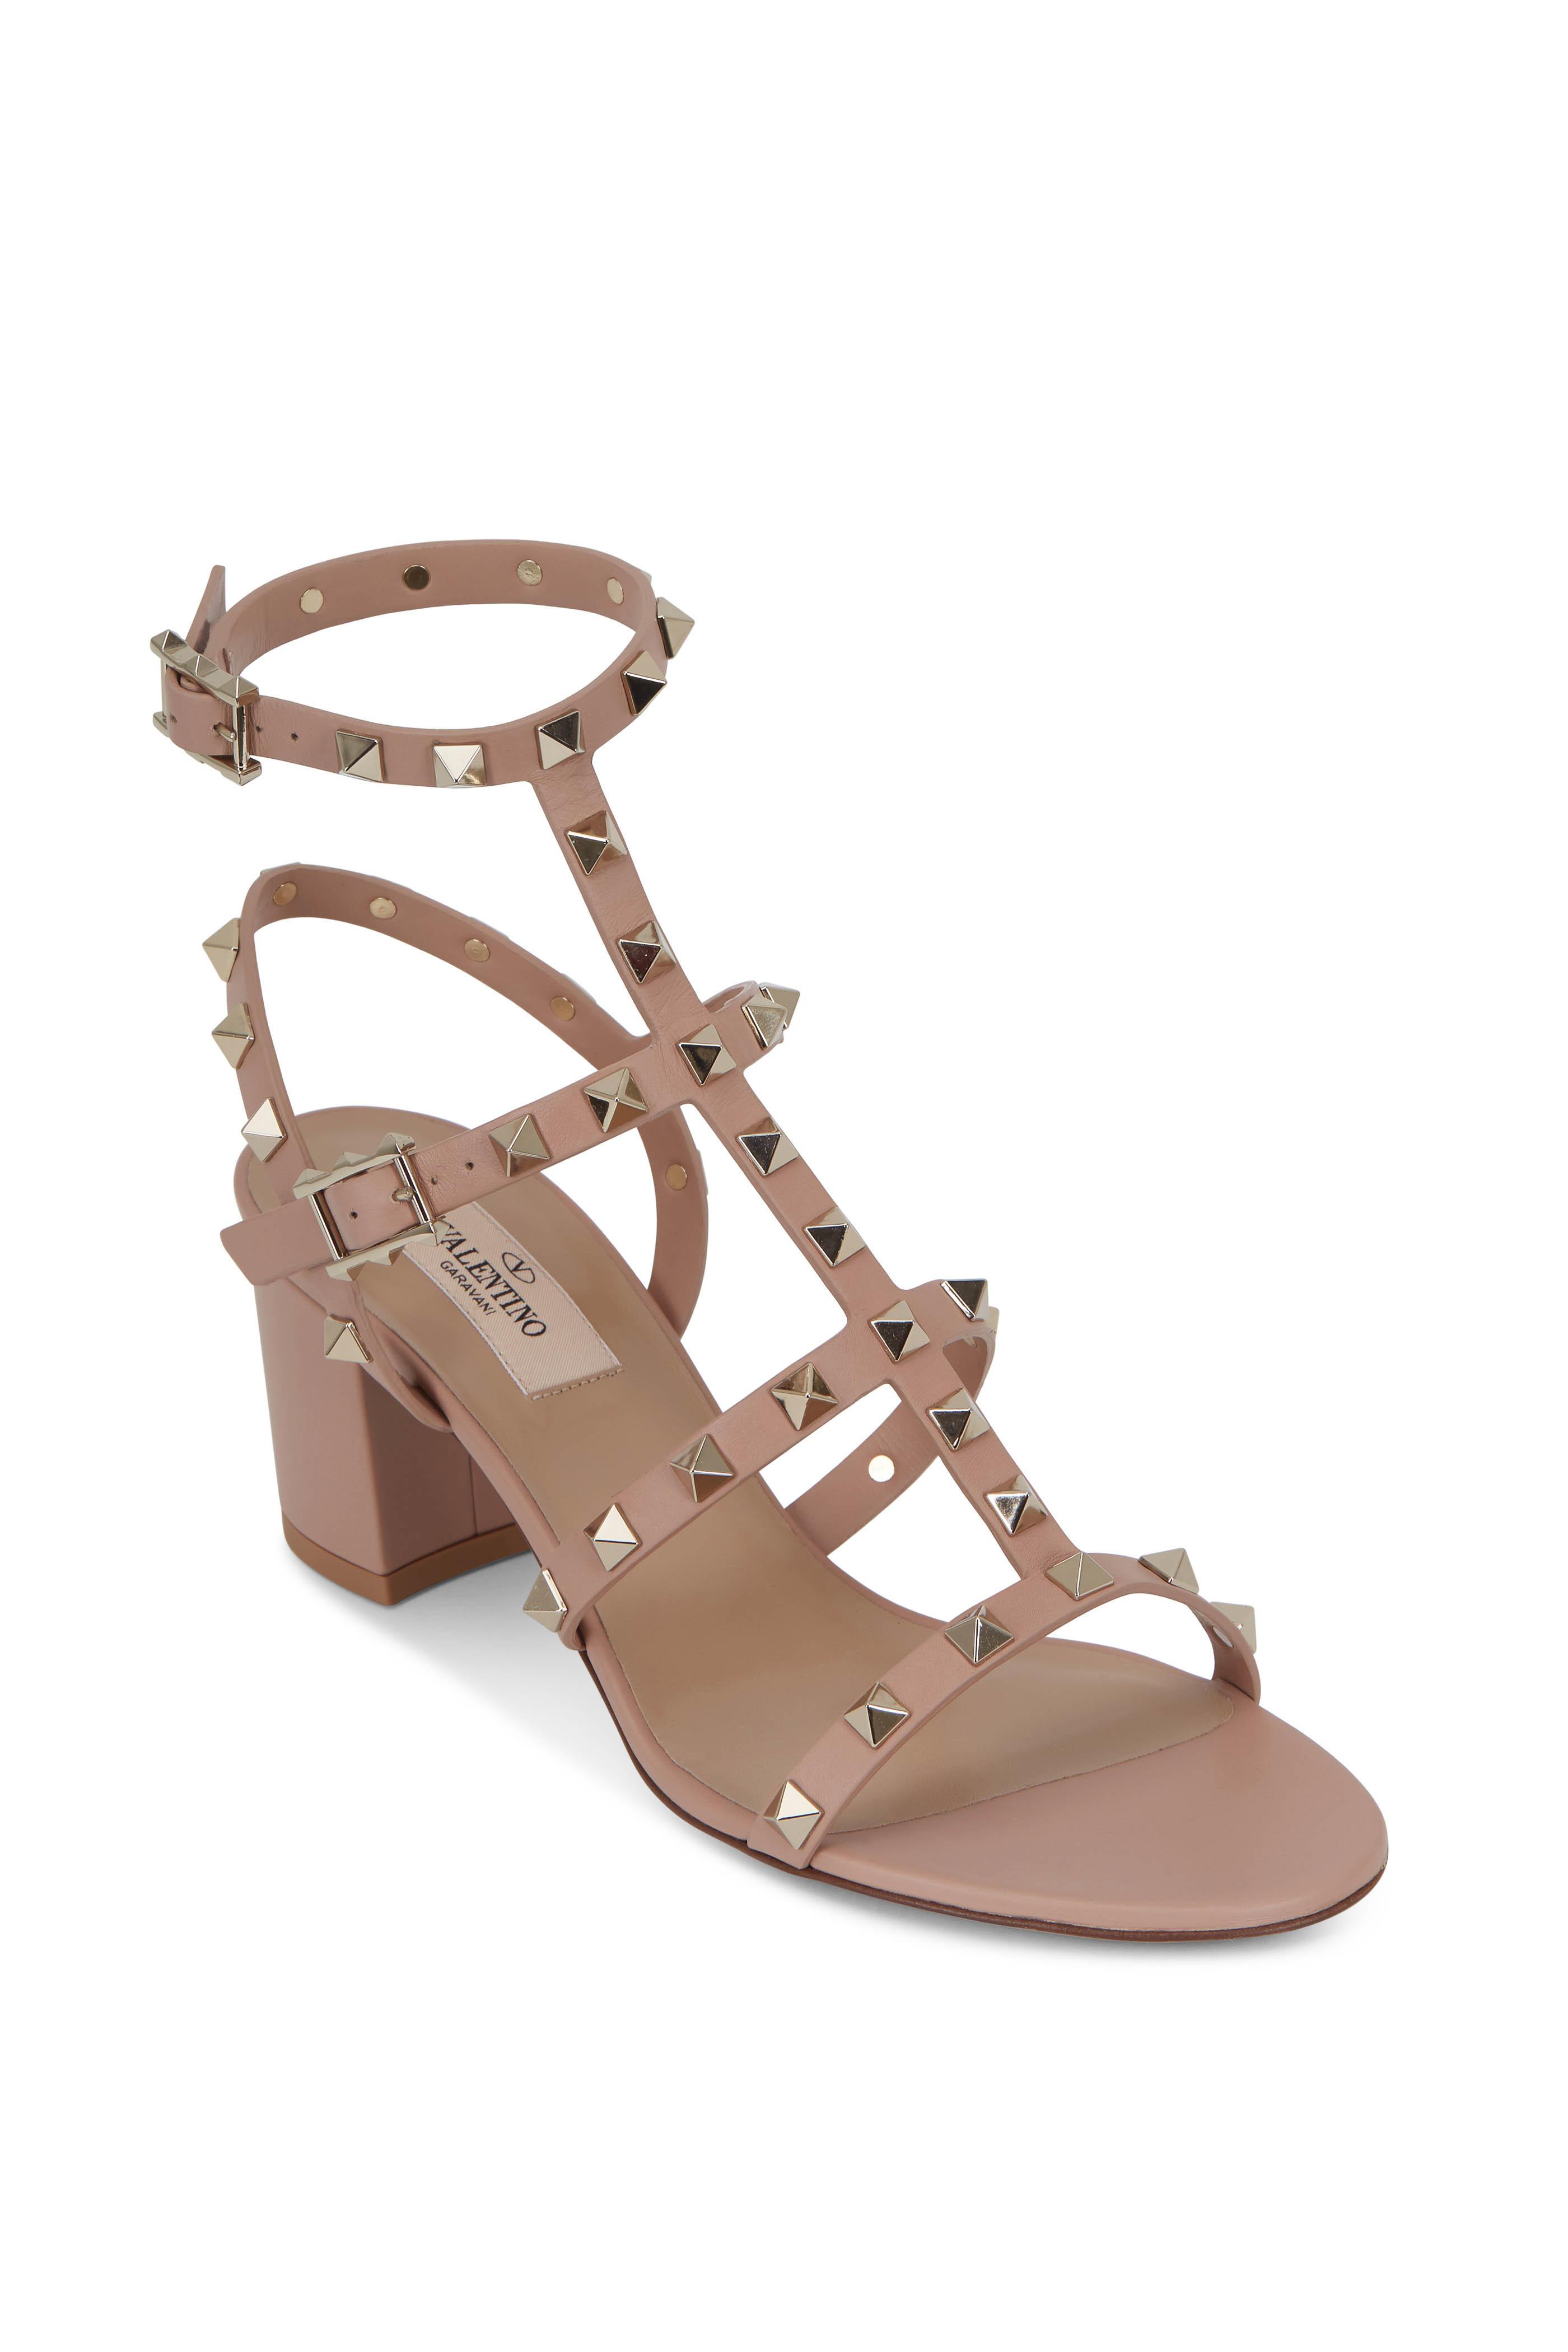 7d72d262f974 Valentino Garavani - Rockstud Rose Leather T-Strap Sandal